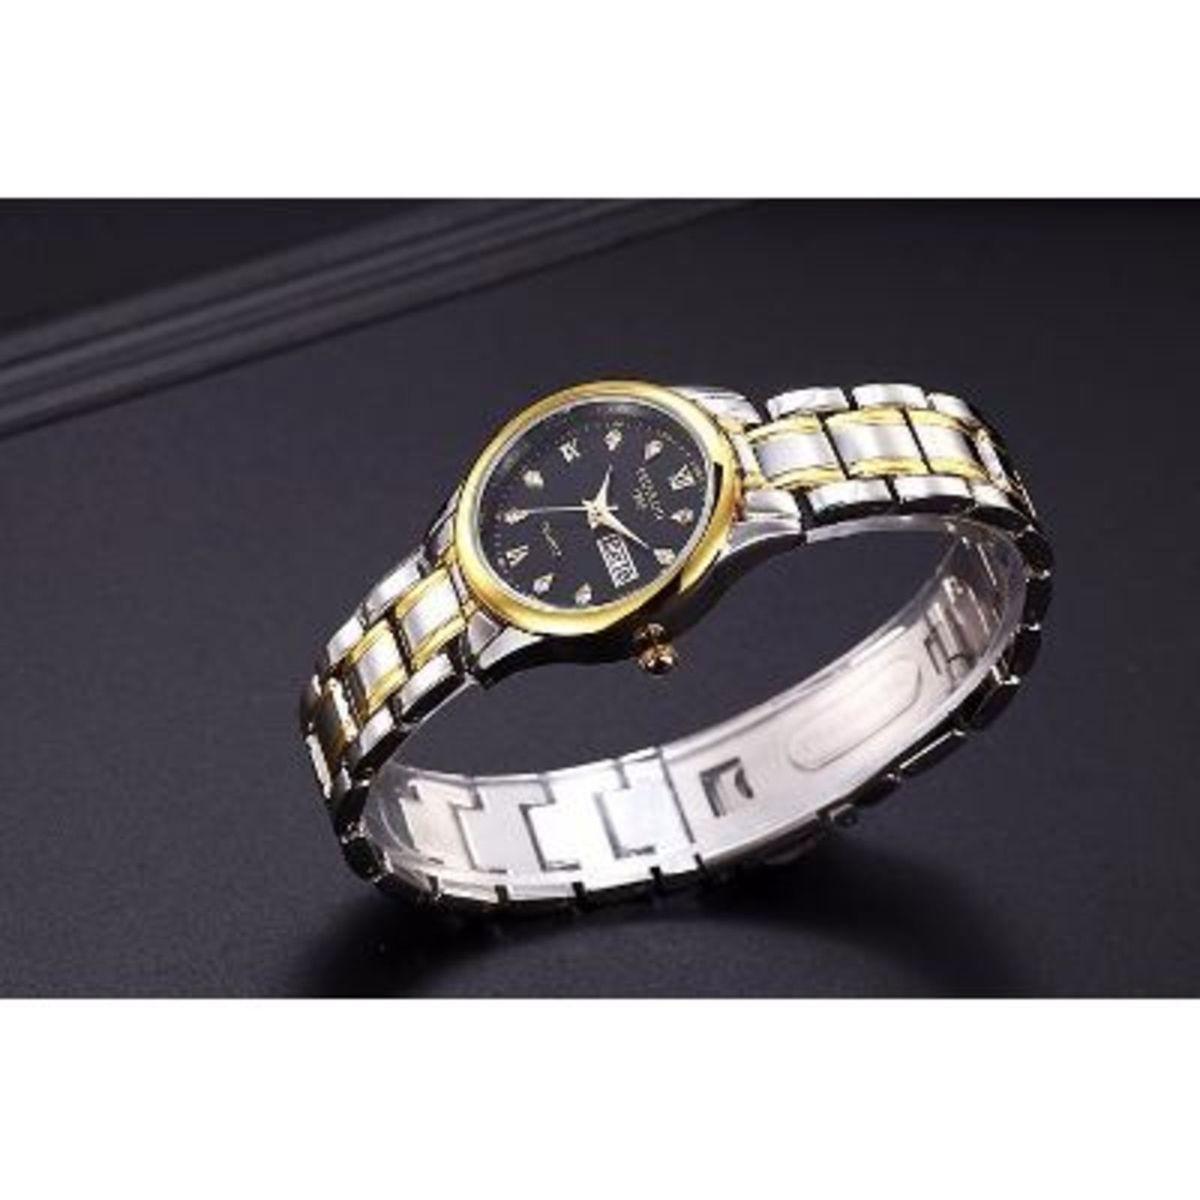 ad6e7374819 relógio feminino (modelo grande) - relógios relogio-feminino